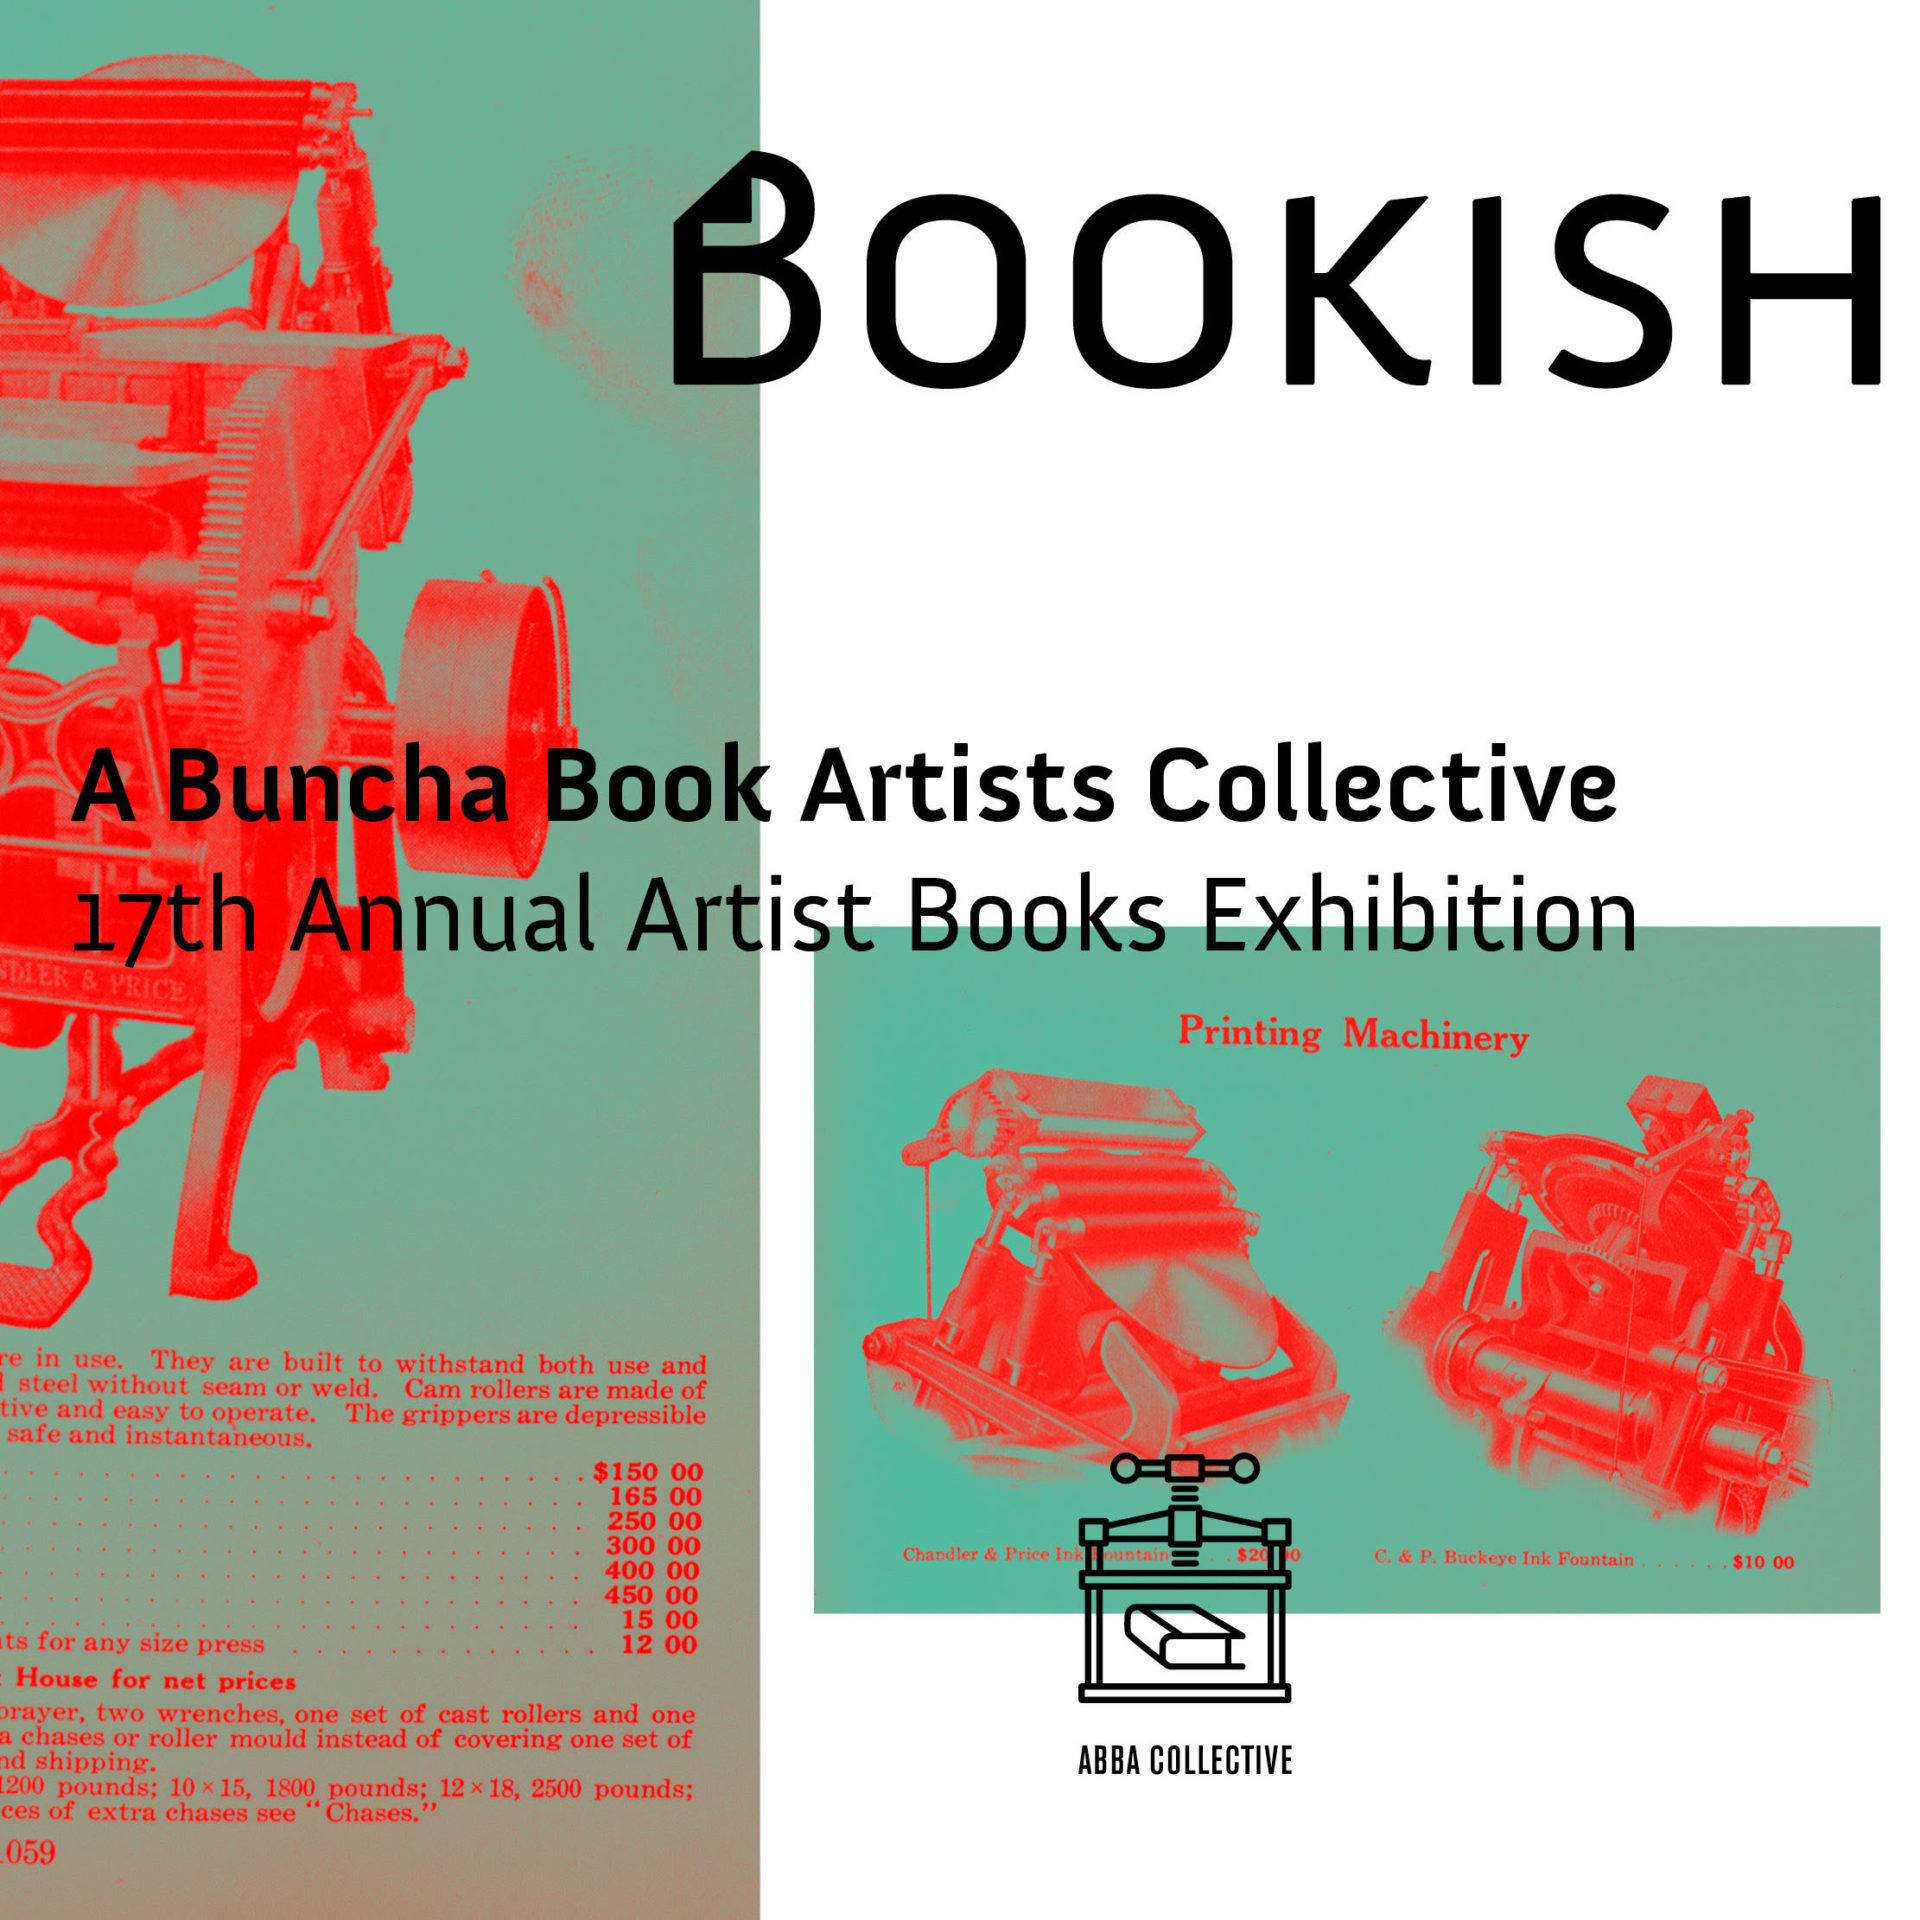 Bookish A Buncha Book Artists Member Exhibition